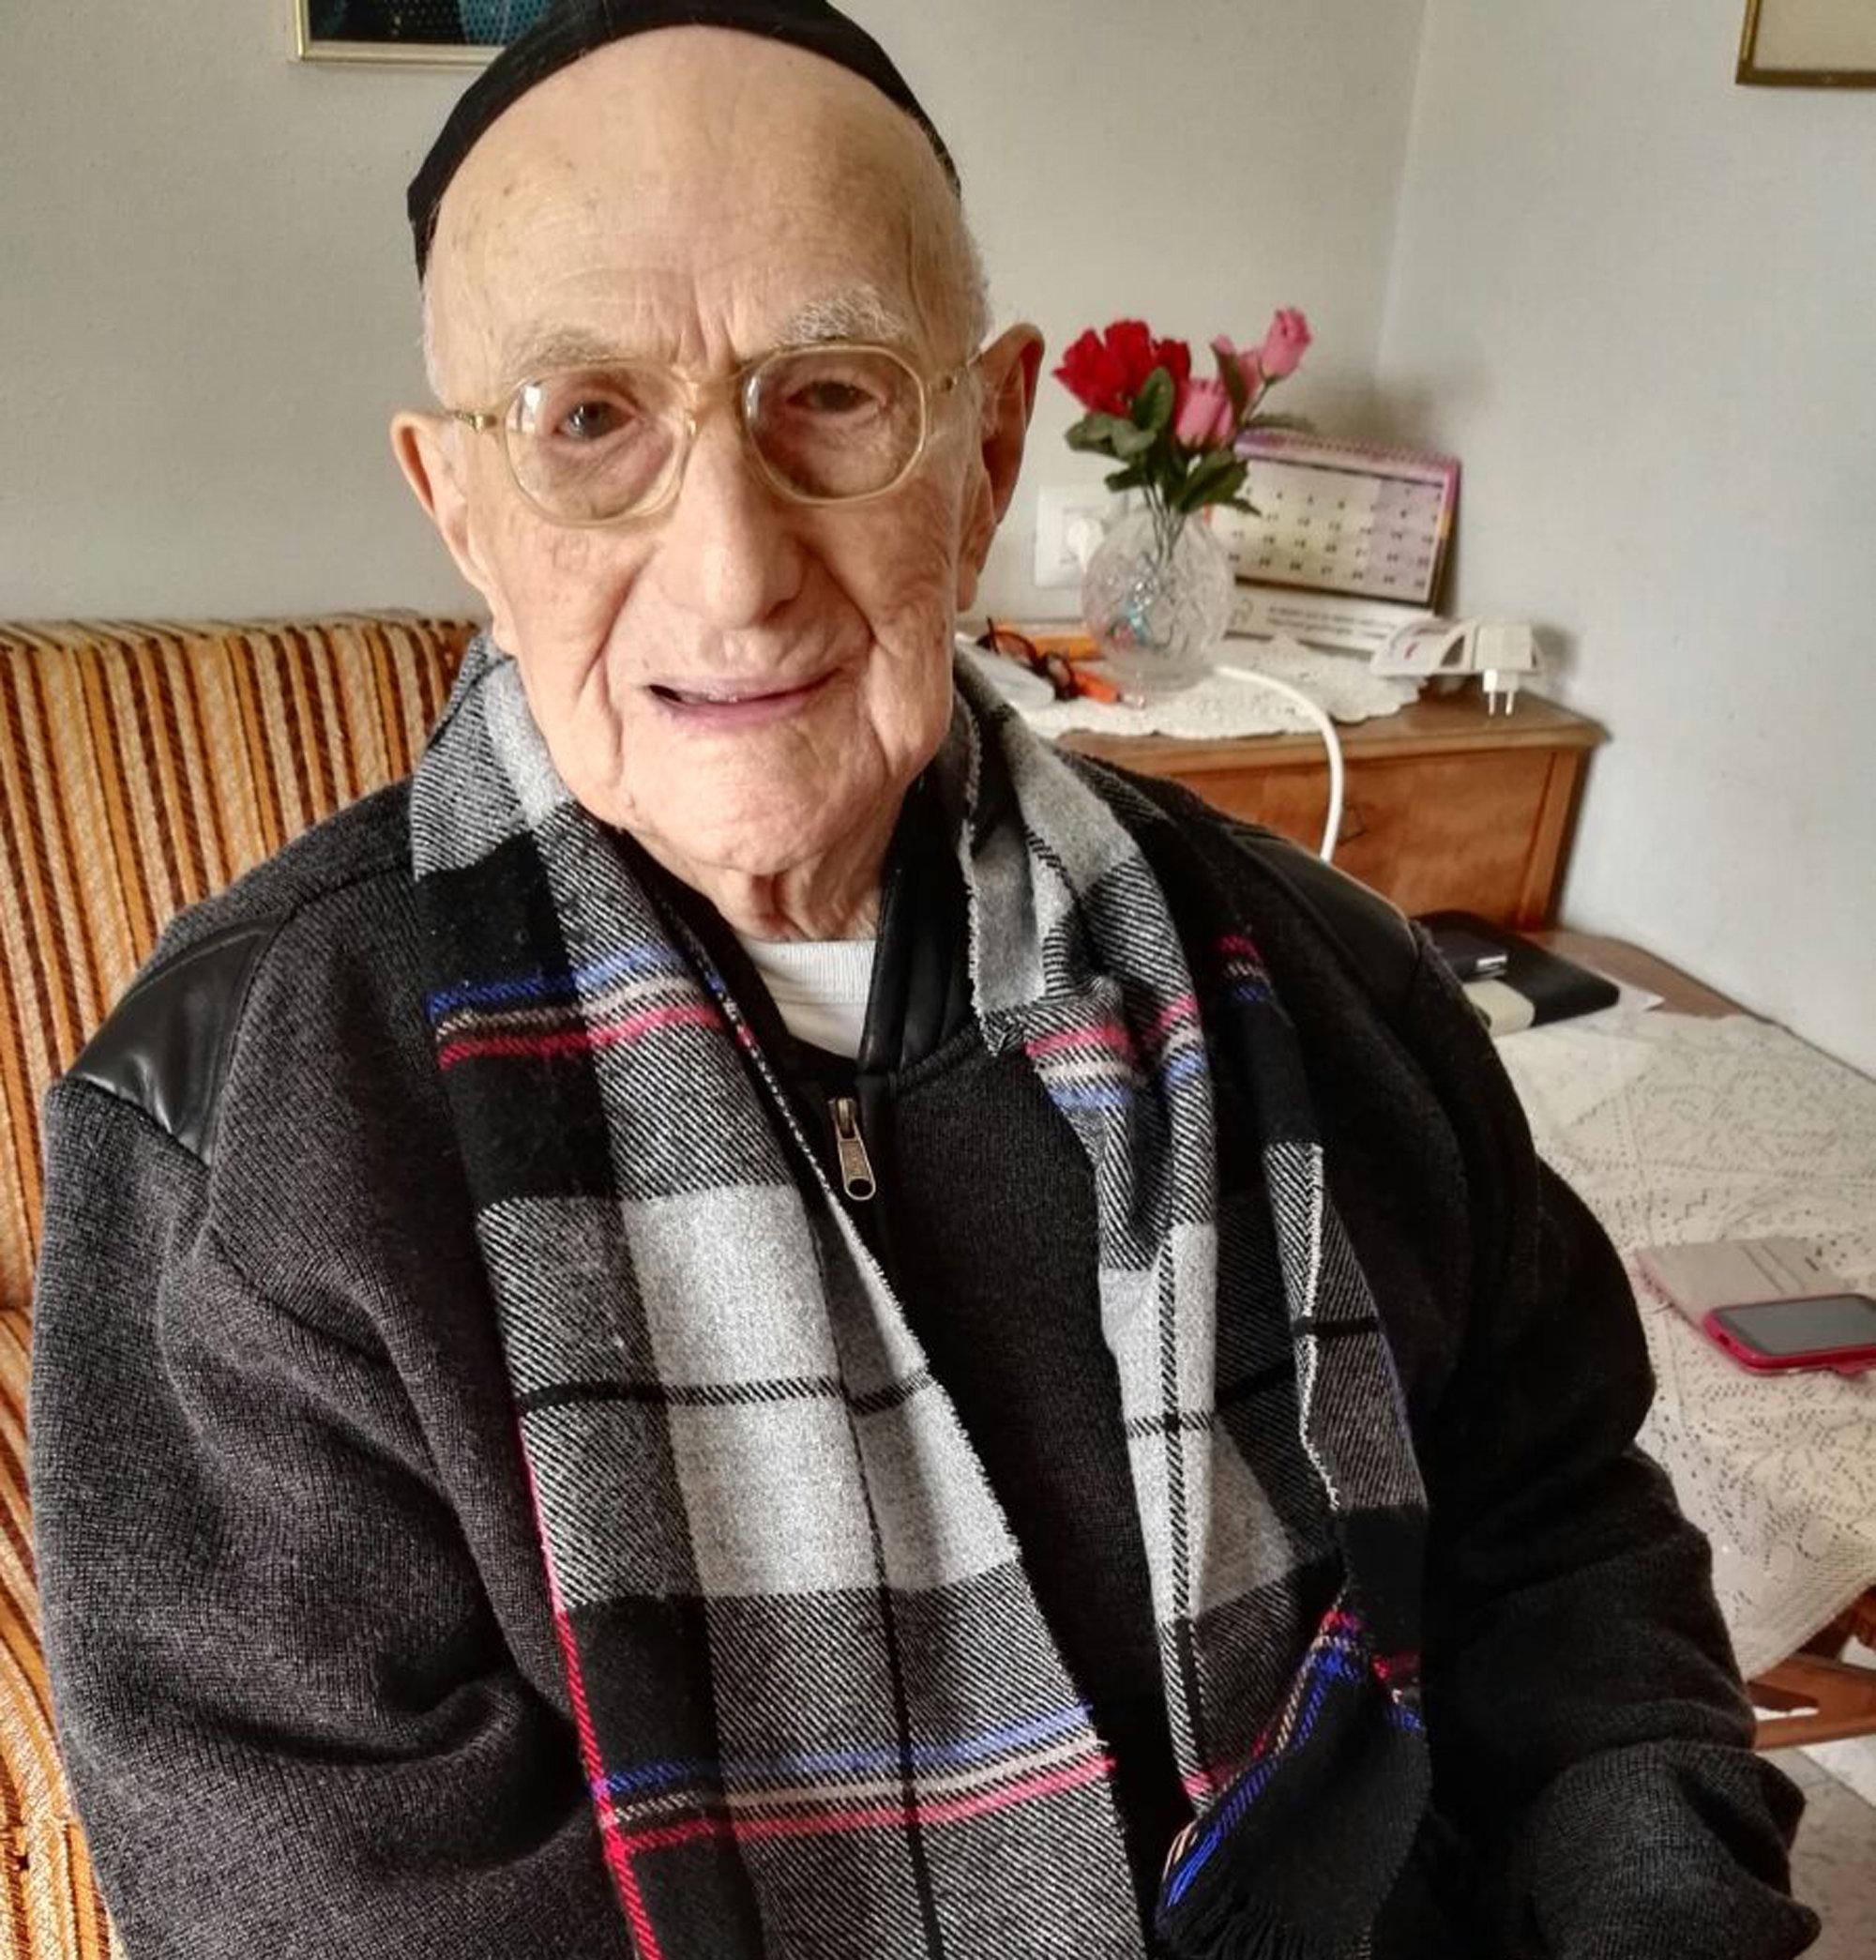 World's Oldest Man, Holocaust Survivor Yisrael Kristal, Dead At